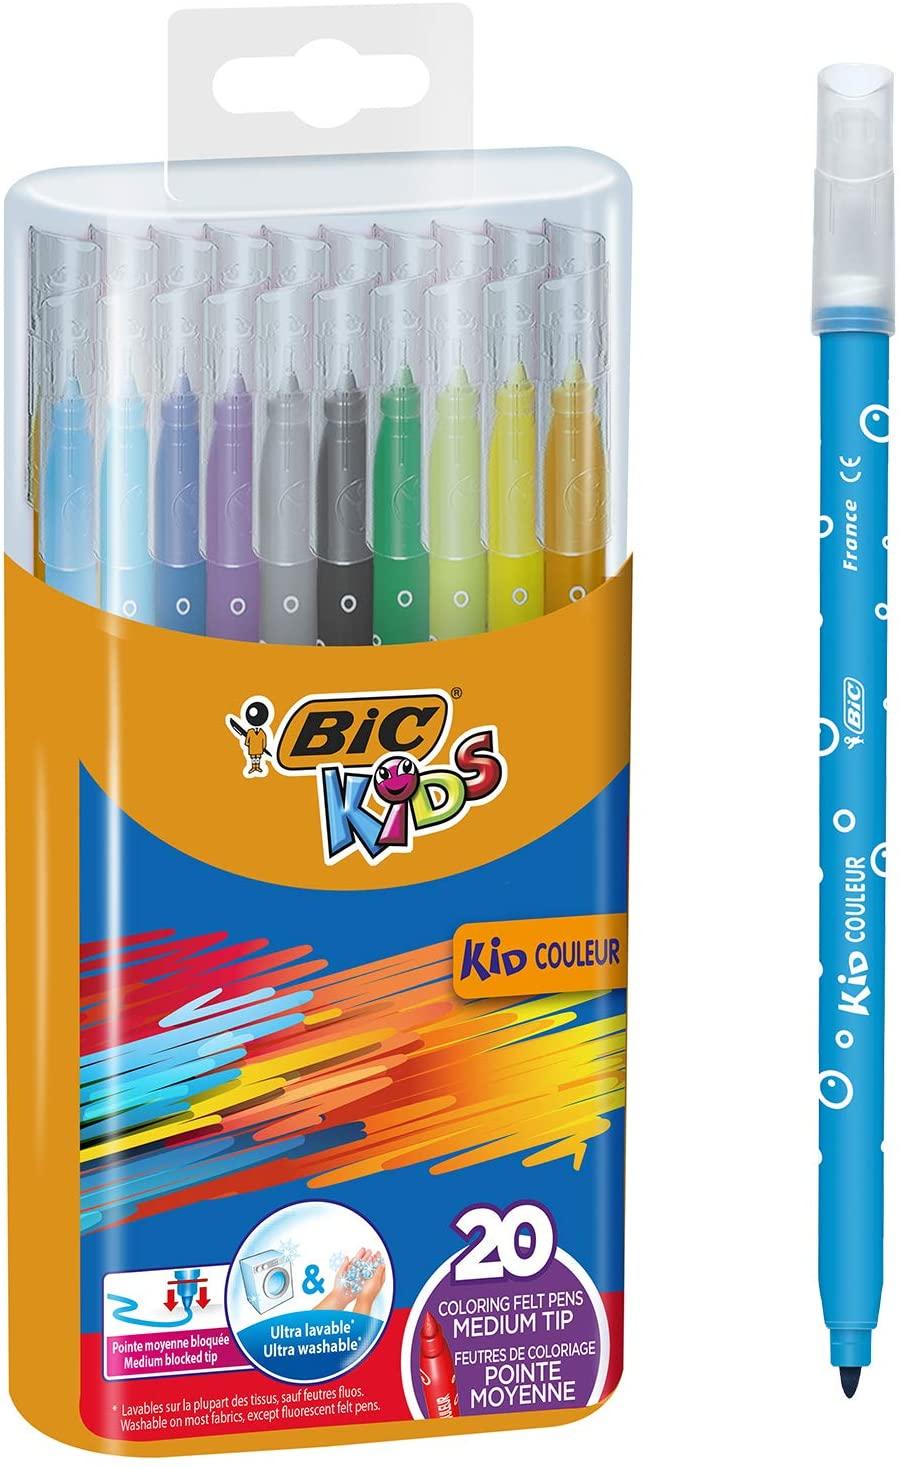 BIC Kids Kid Couleur - Pack de 20 rotuladores de colorear para aprendizaje en caja metálica